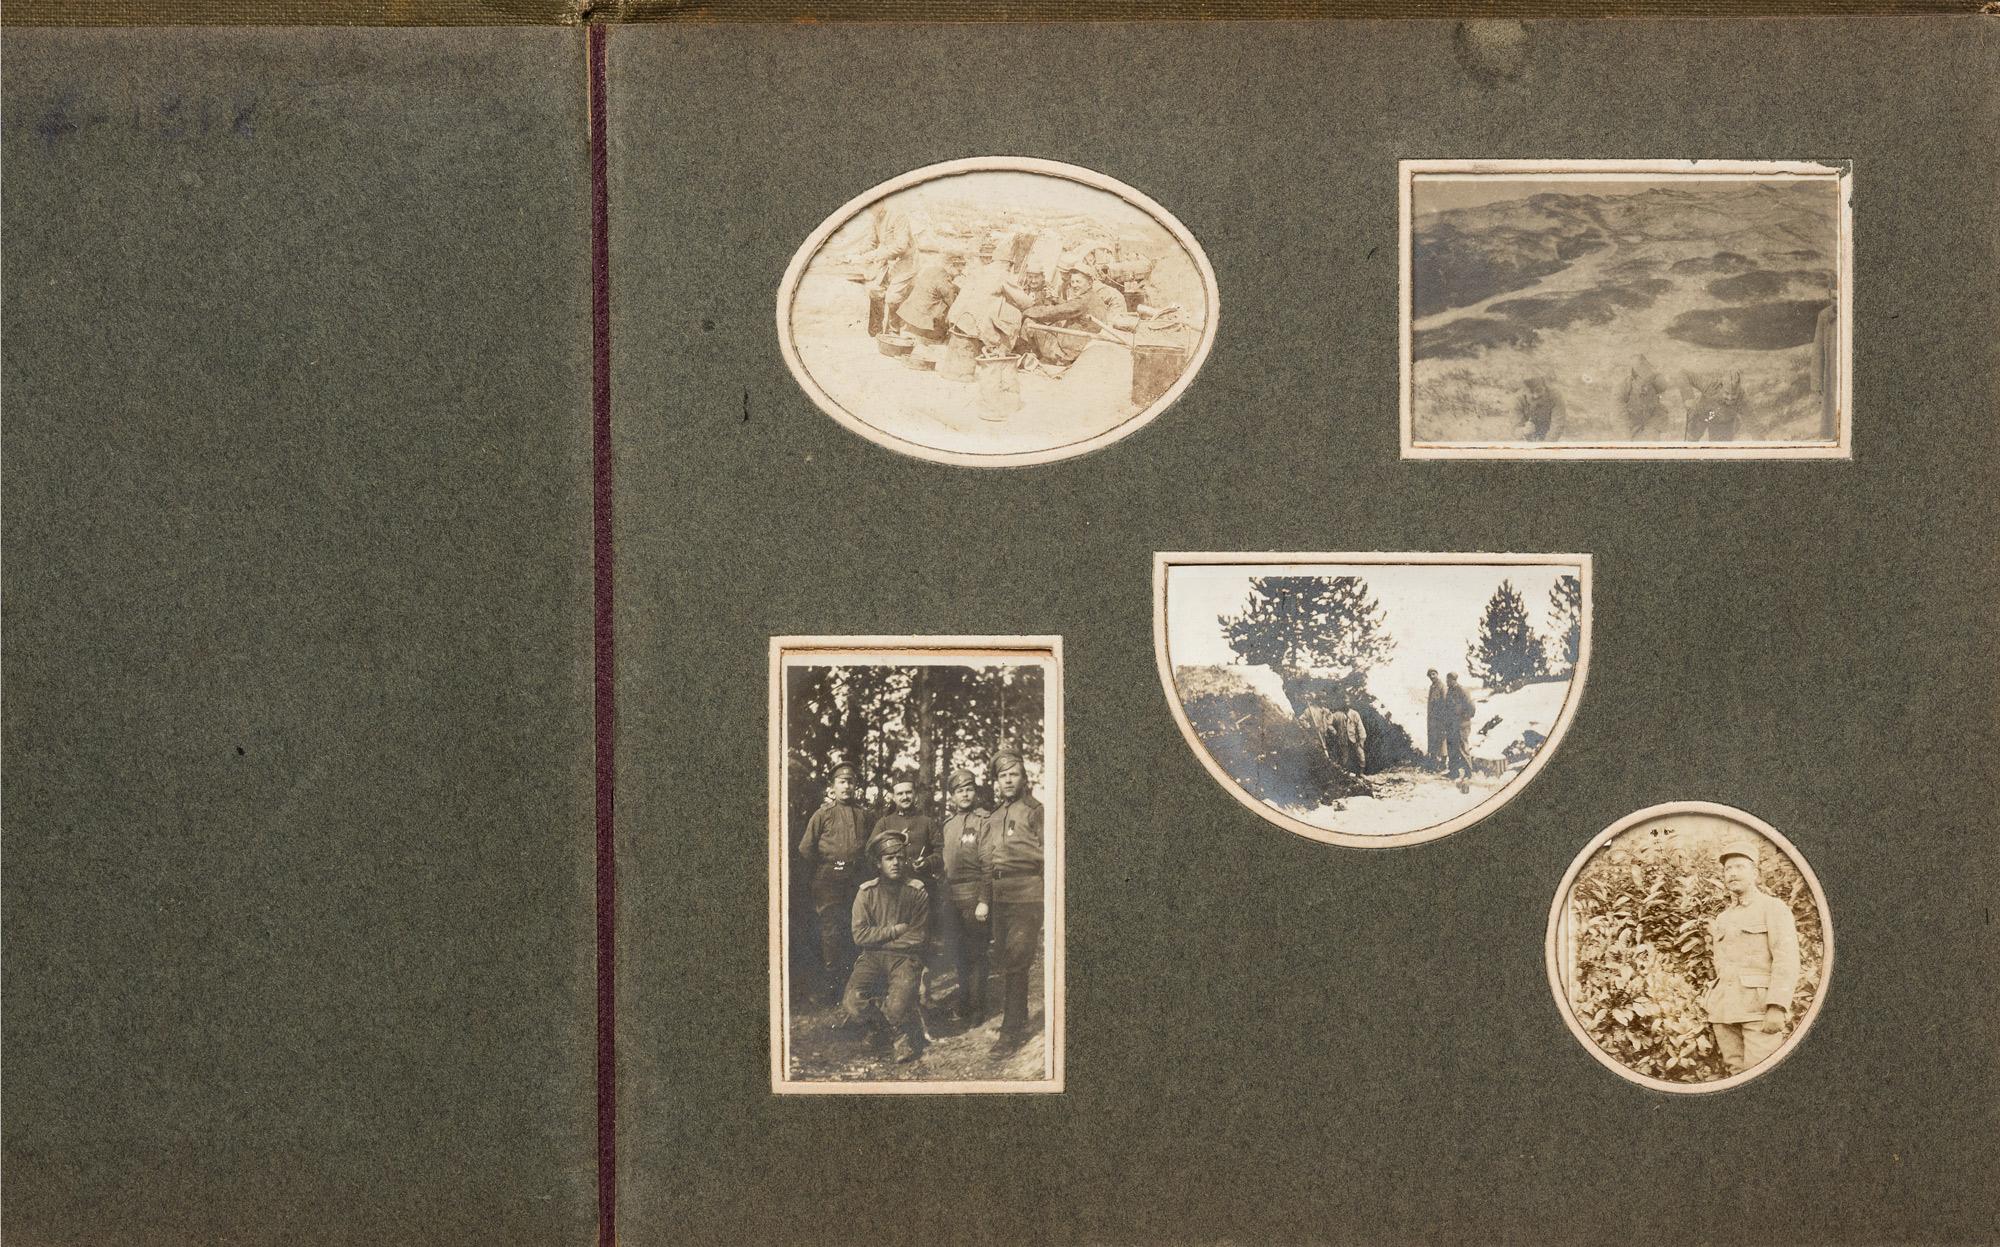 Album di fotografie dal fronte francese